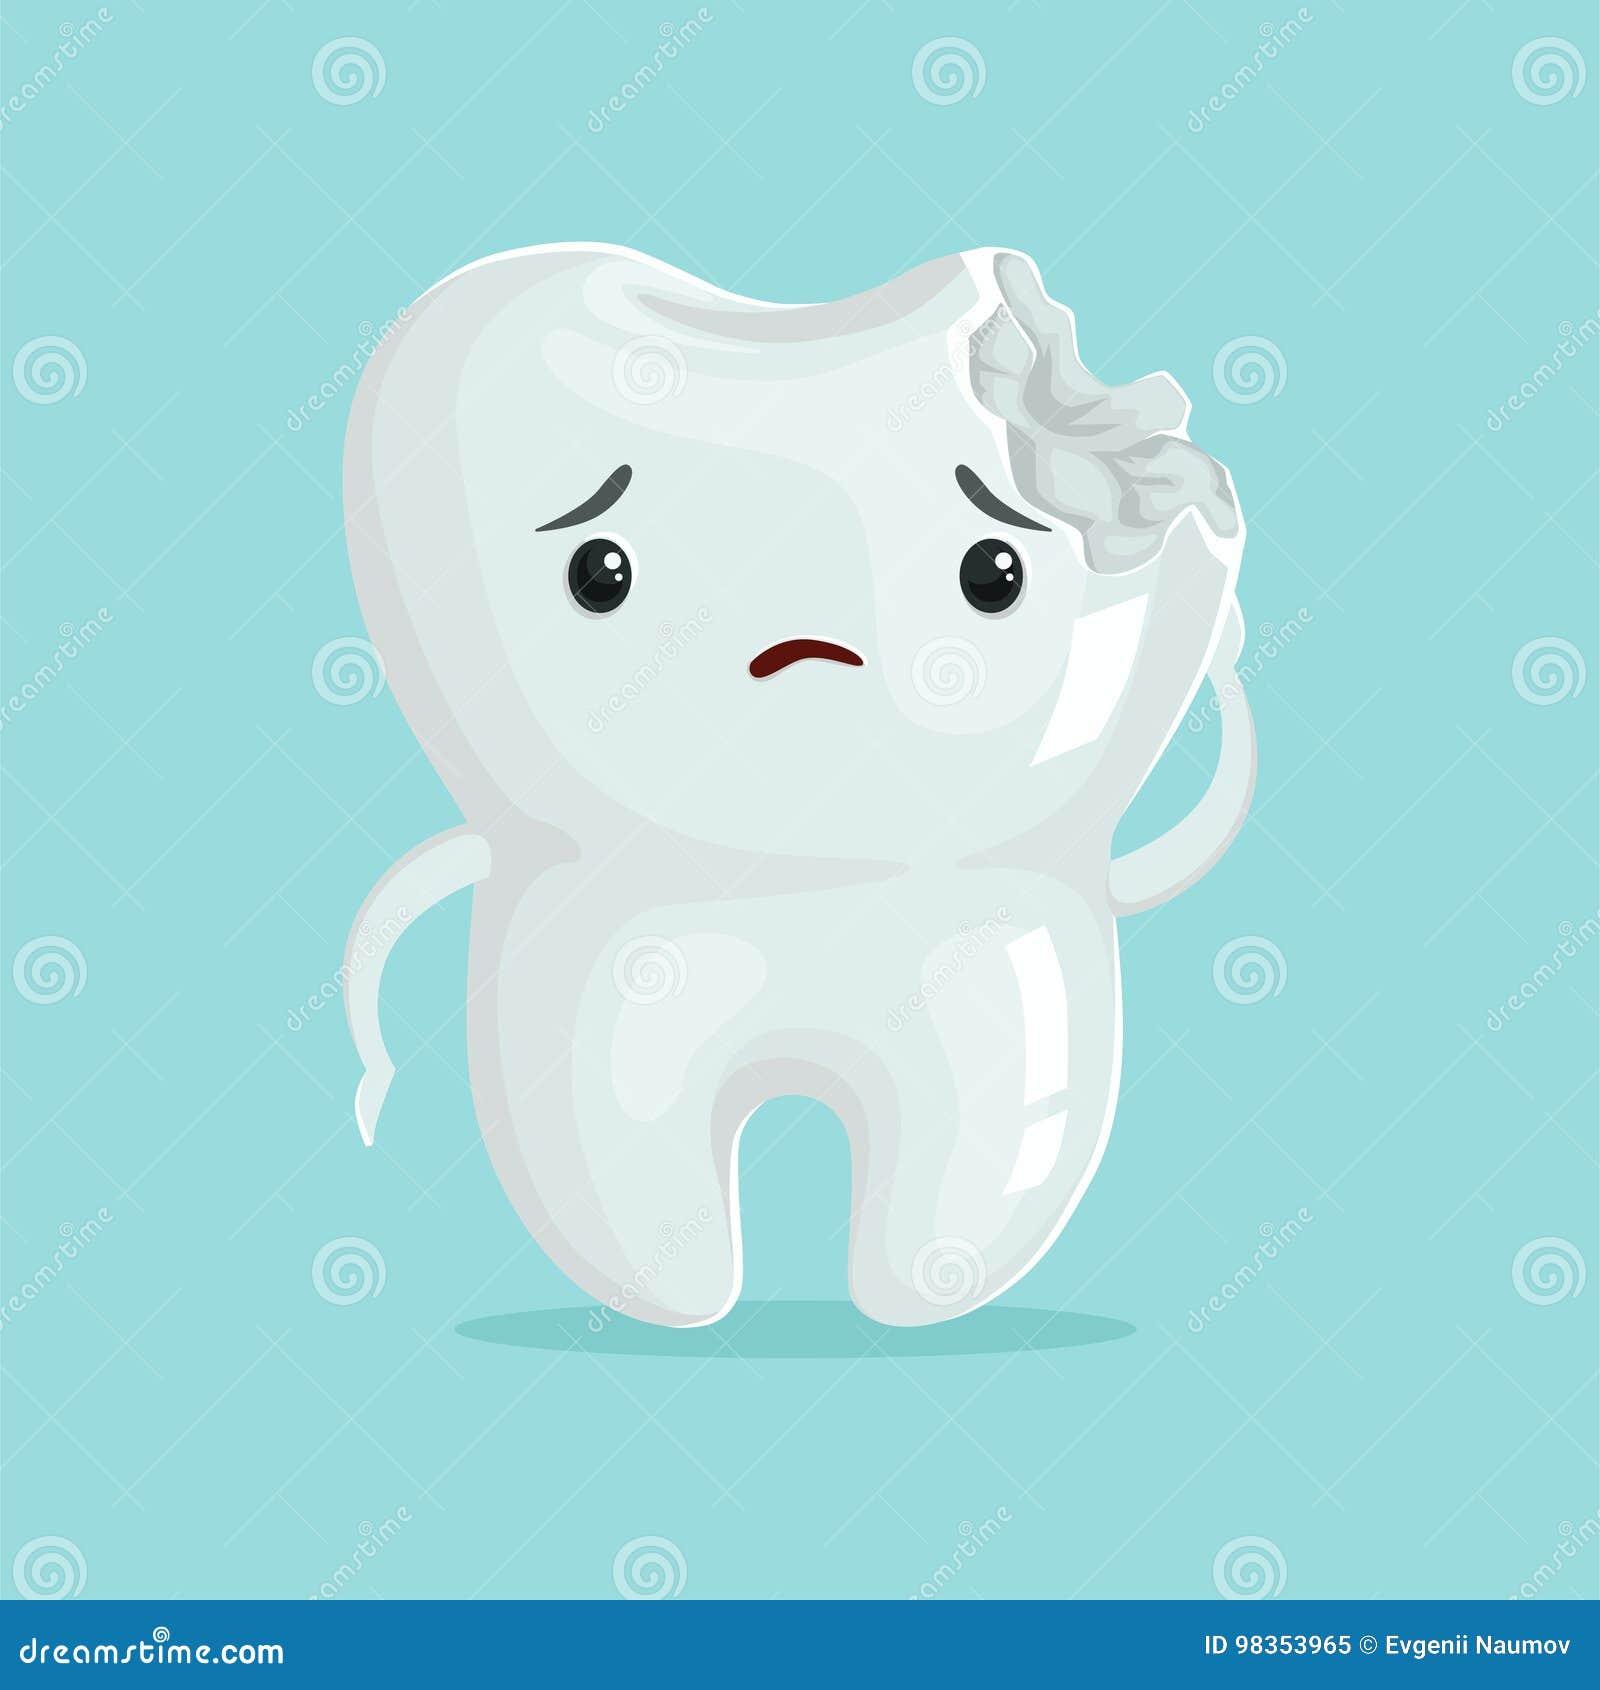 Cute Cartoon Tooth Cavity Vector Illustration